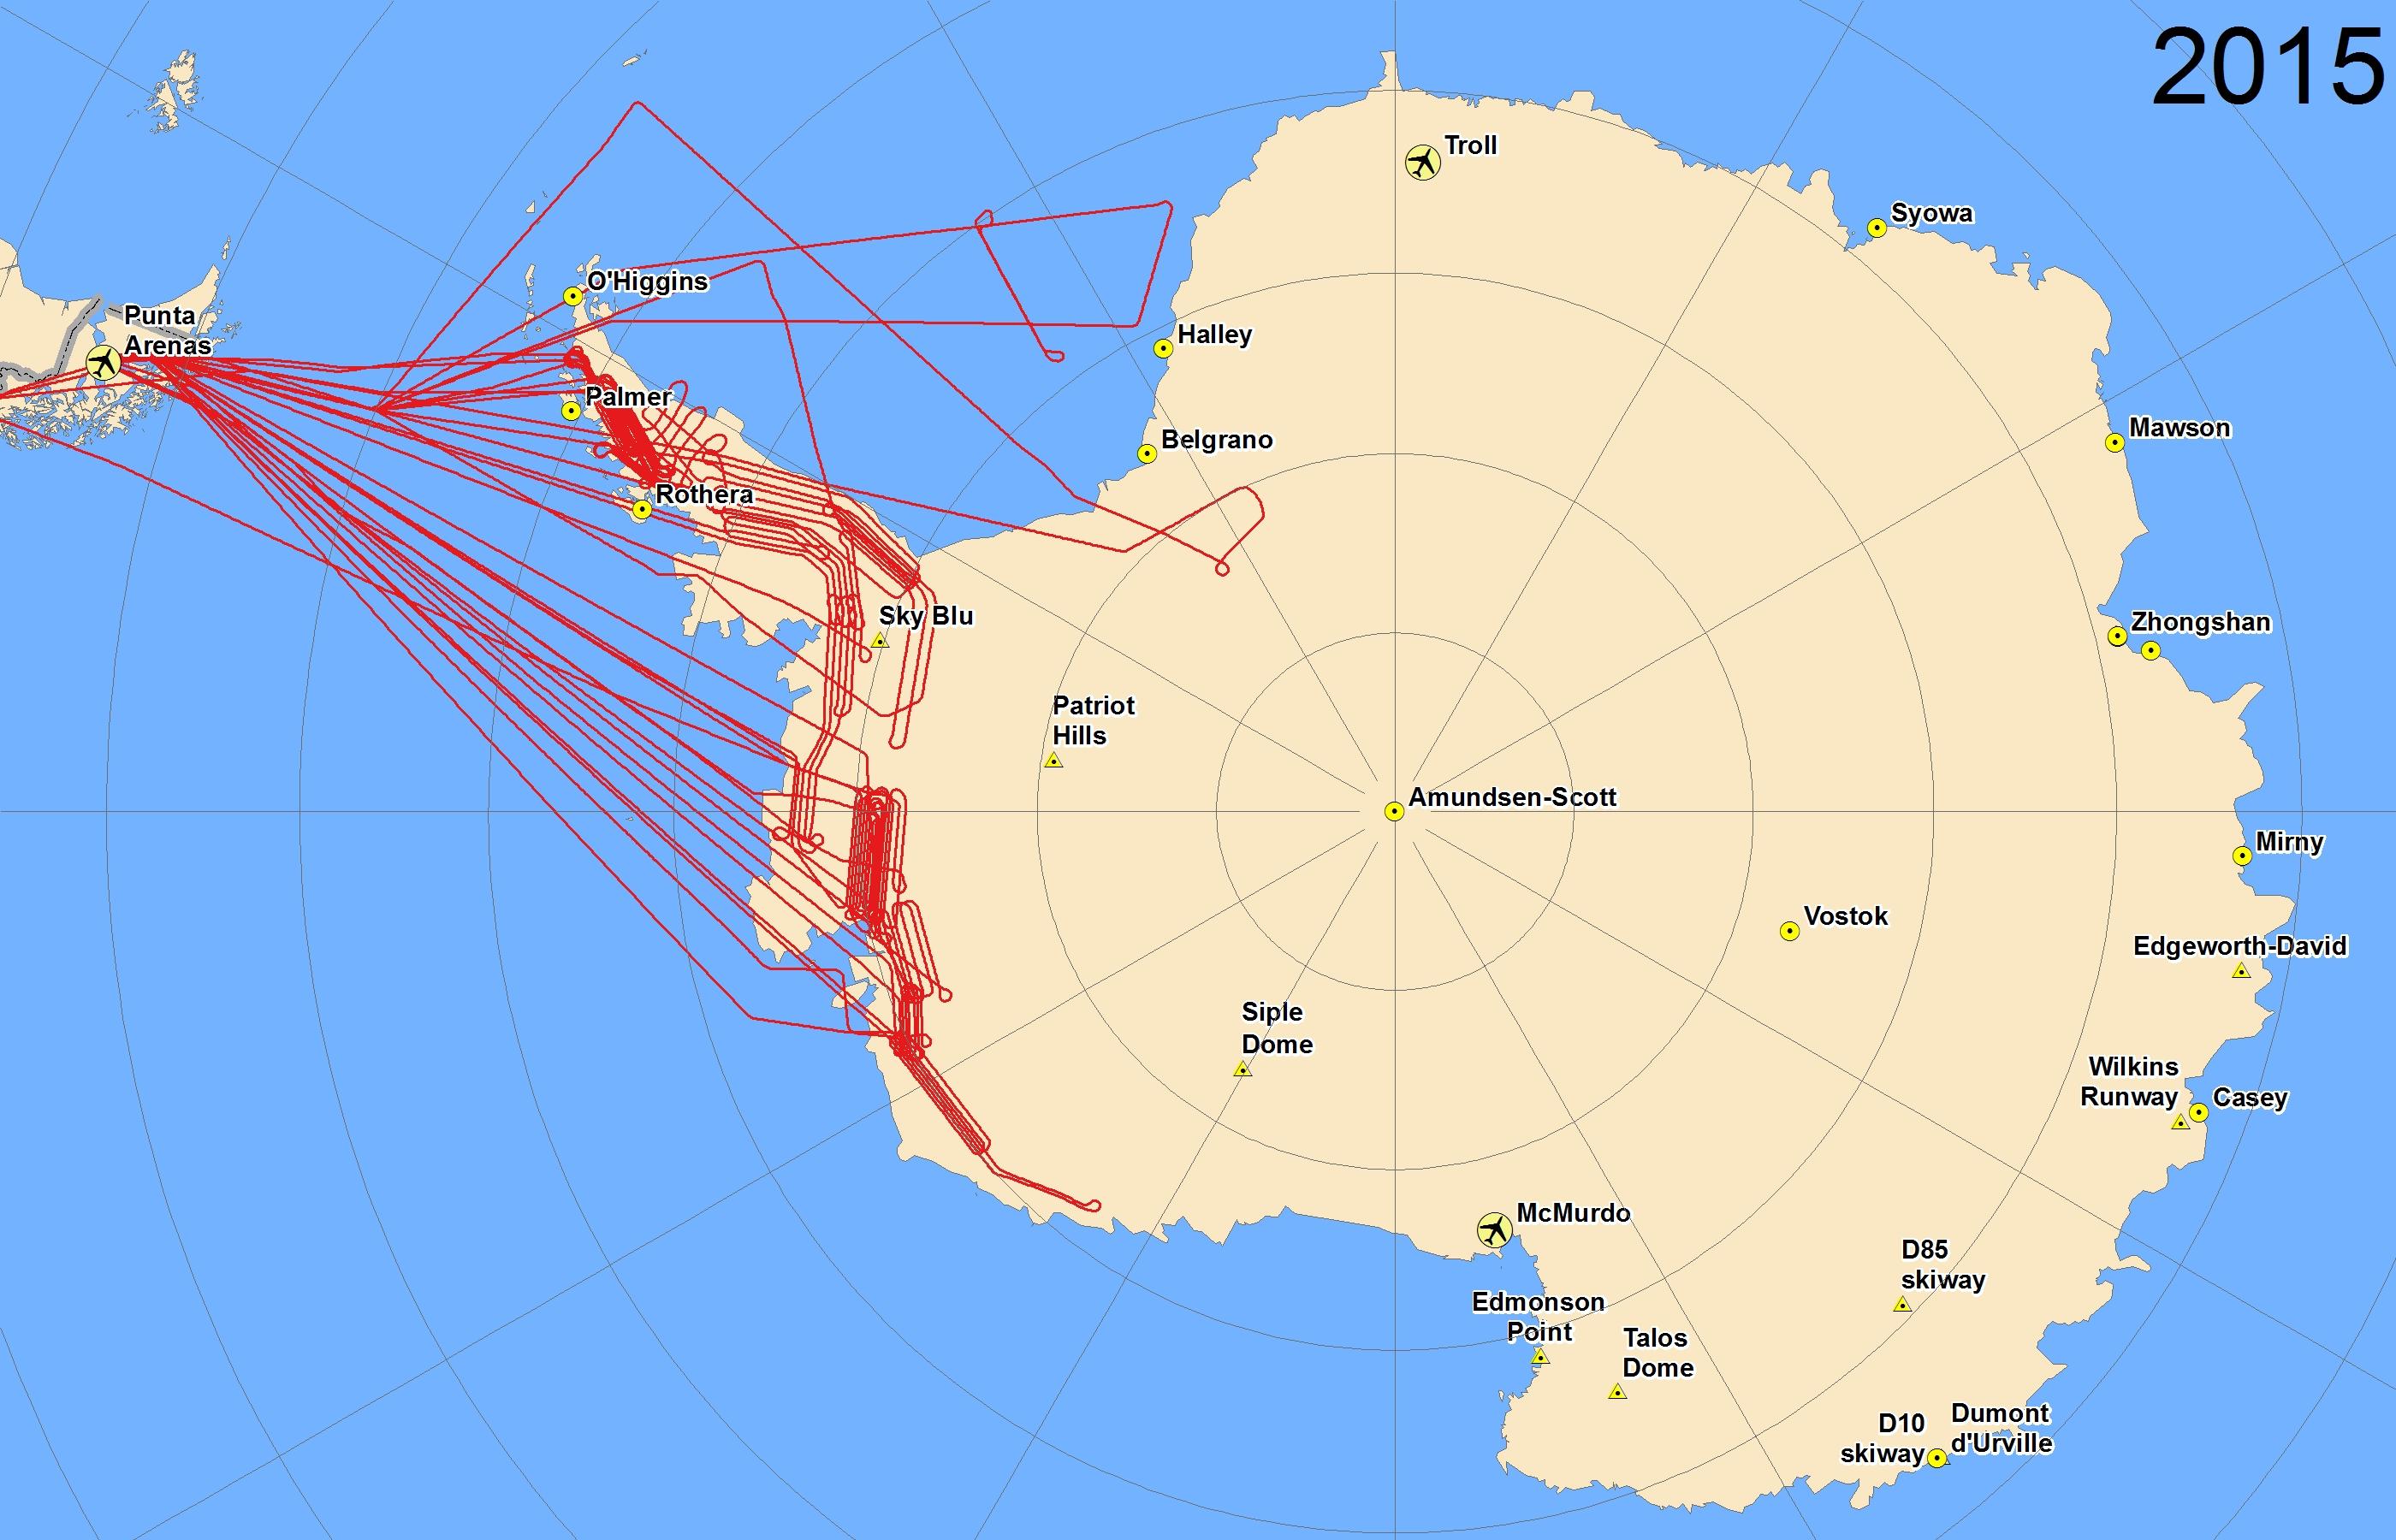 Map of 2015 Antarctic flights